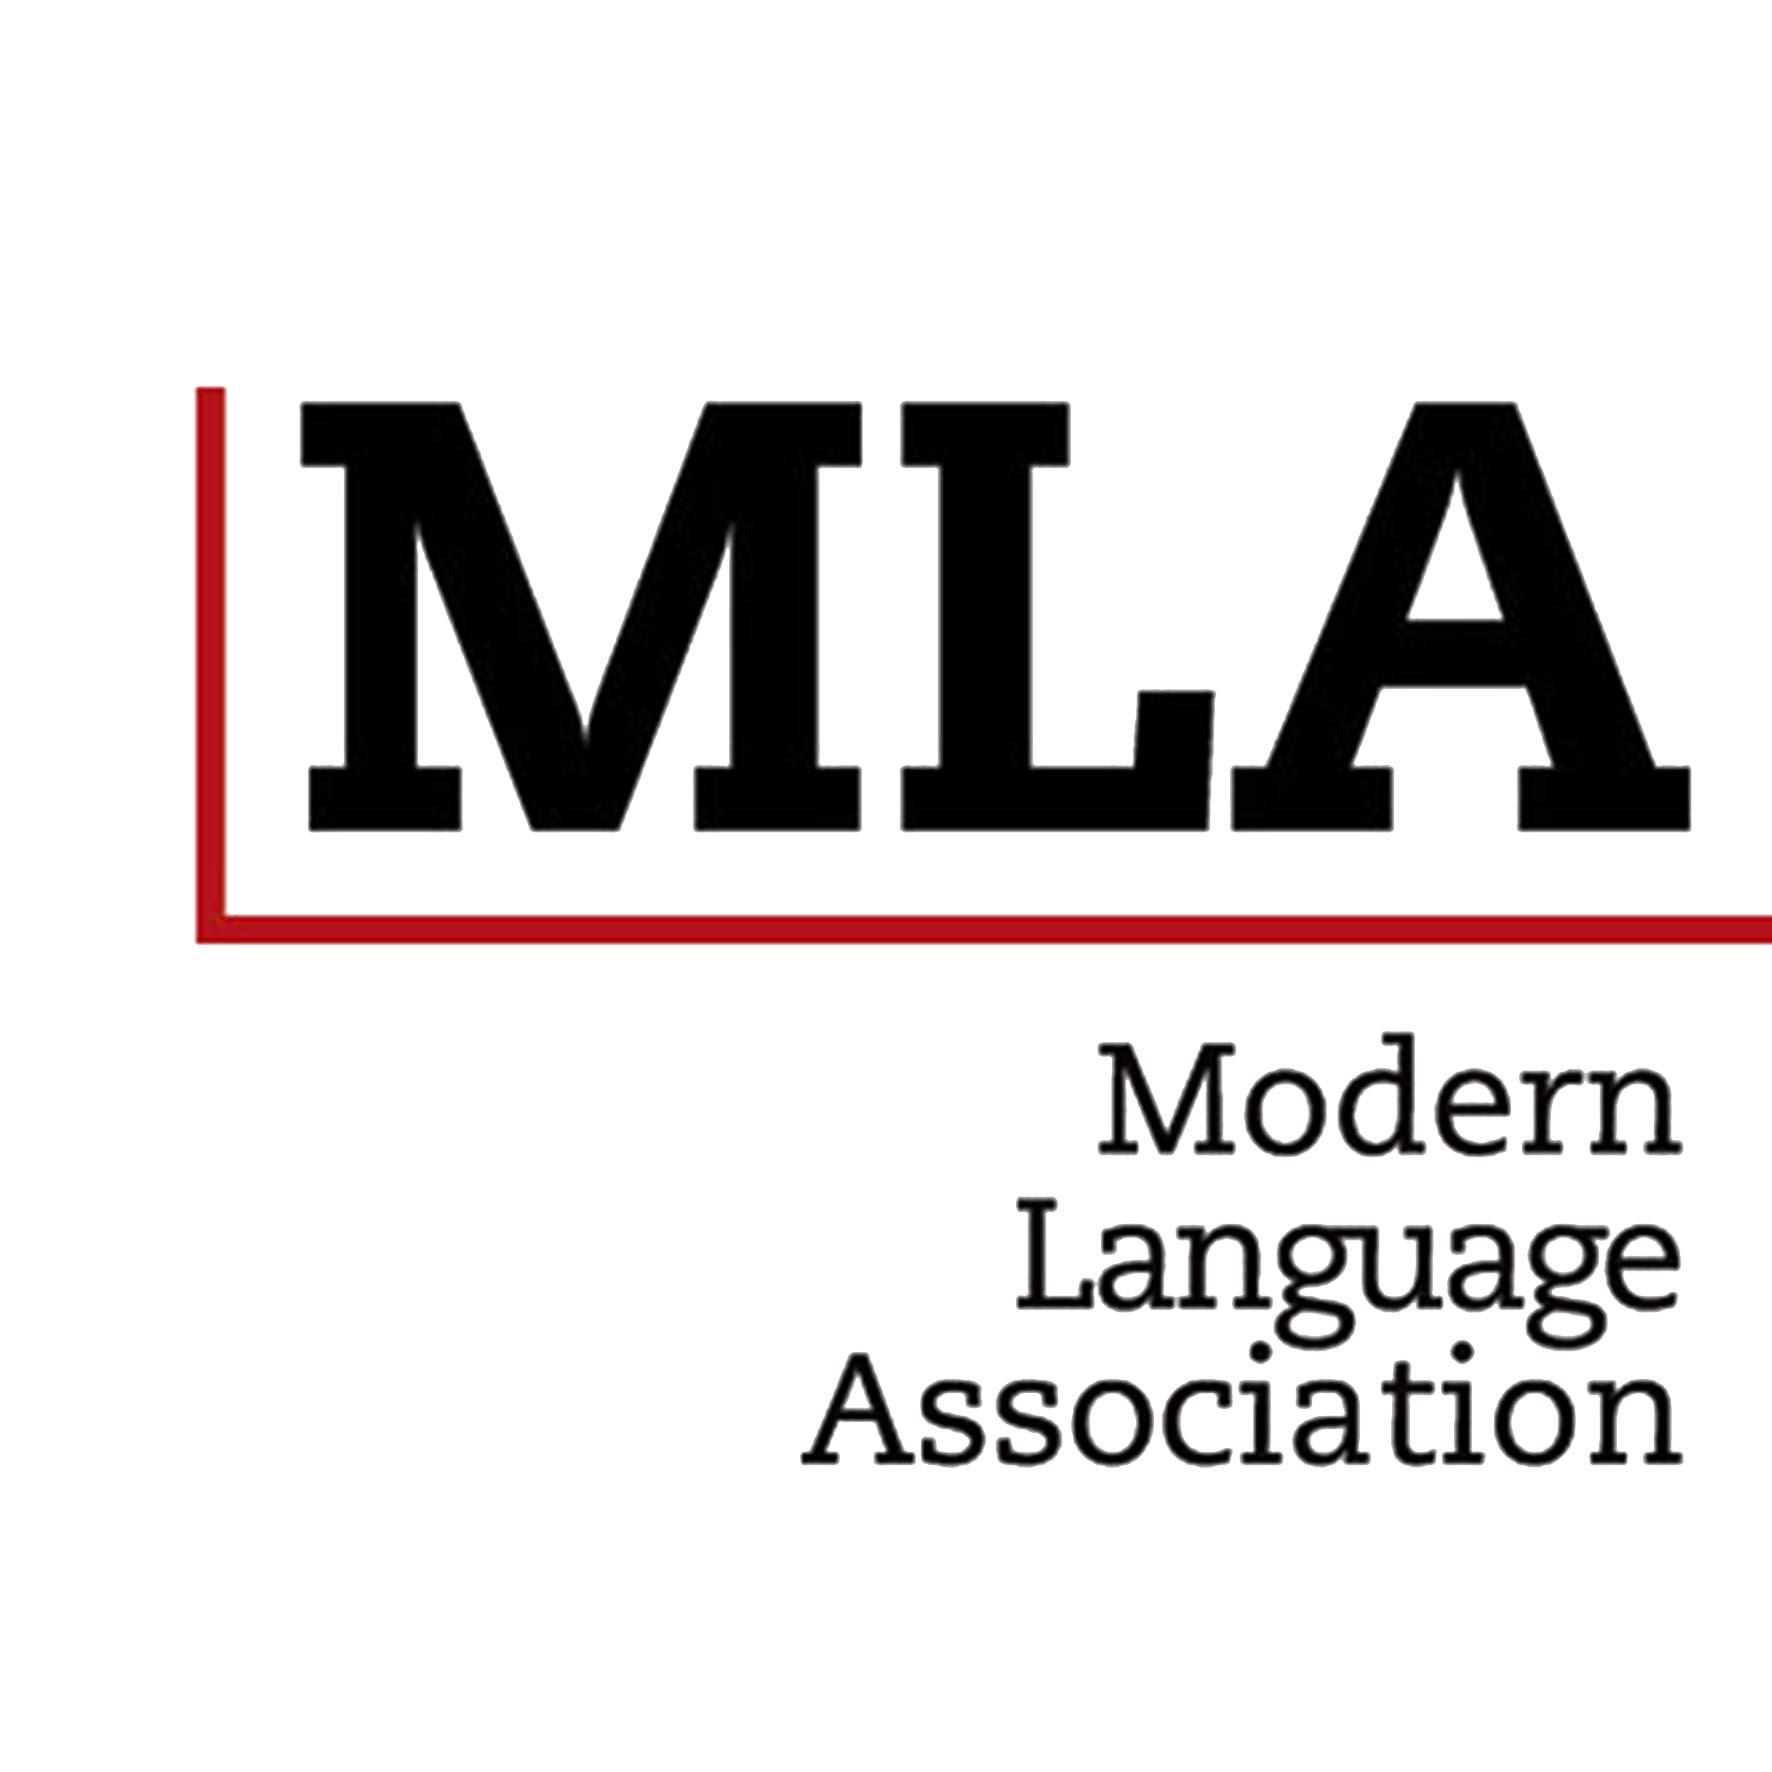 I need help on MLA format